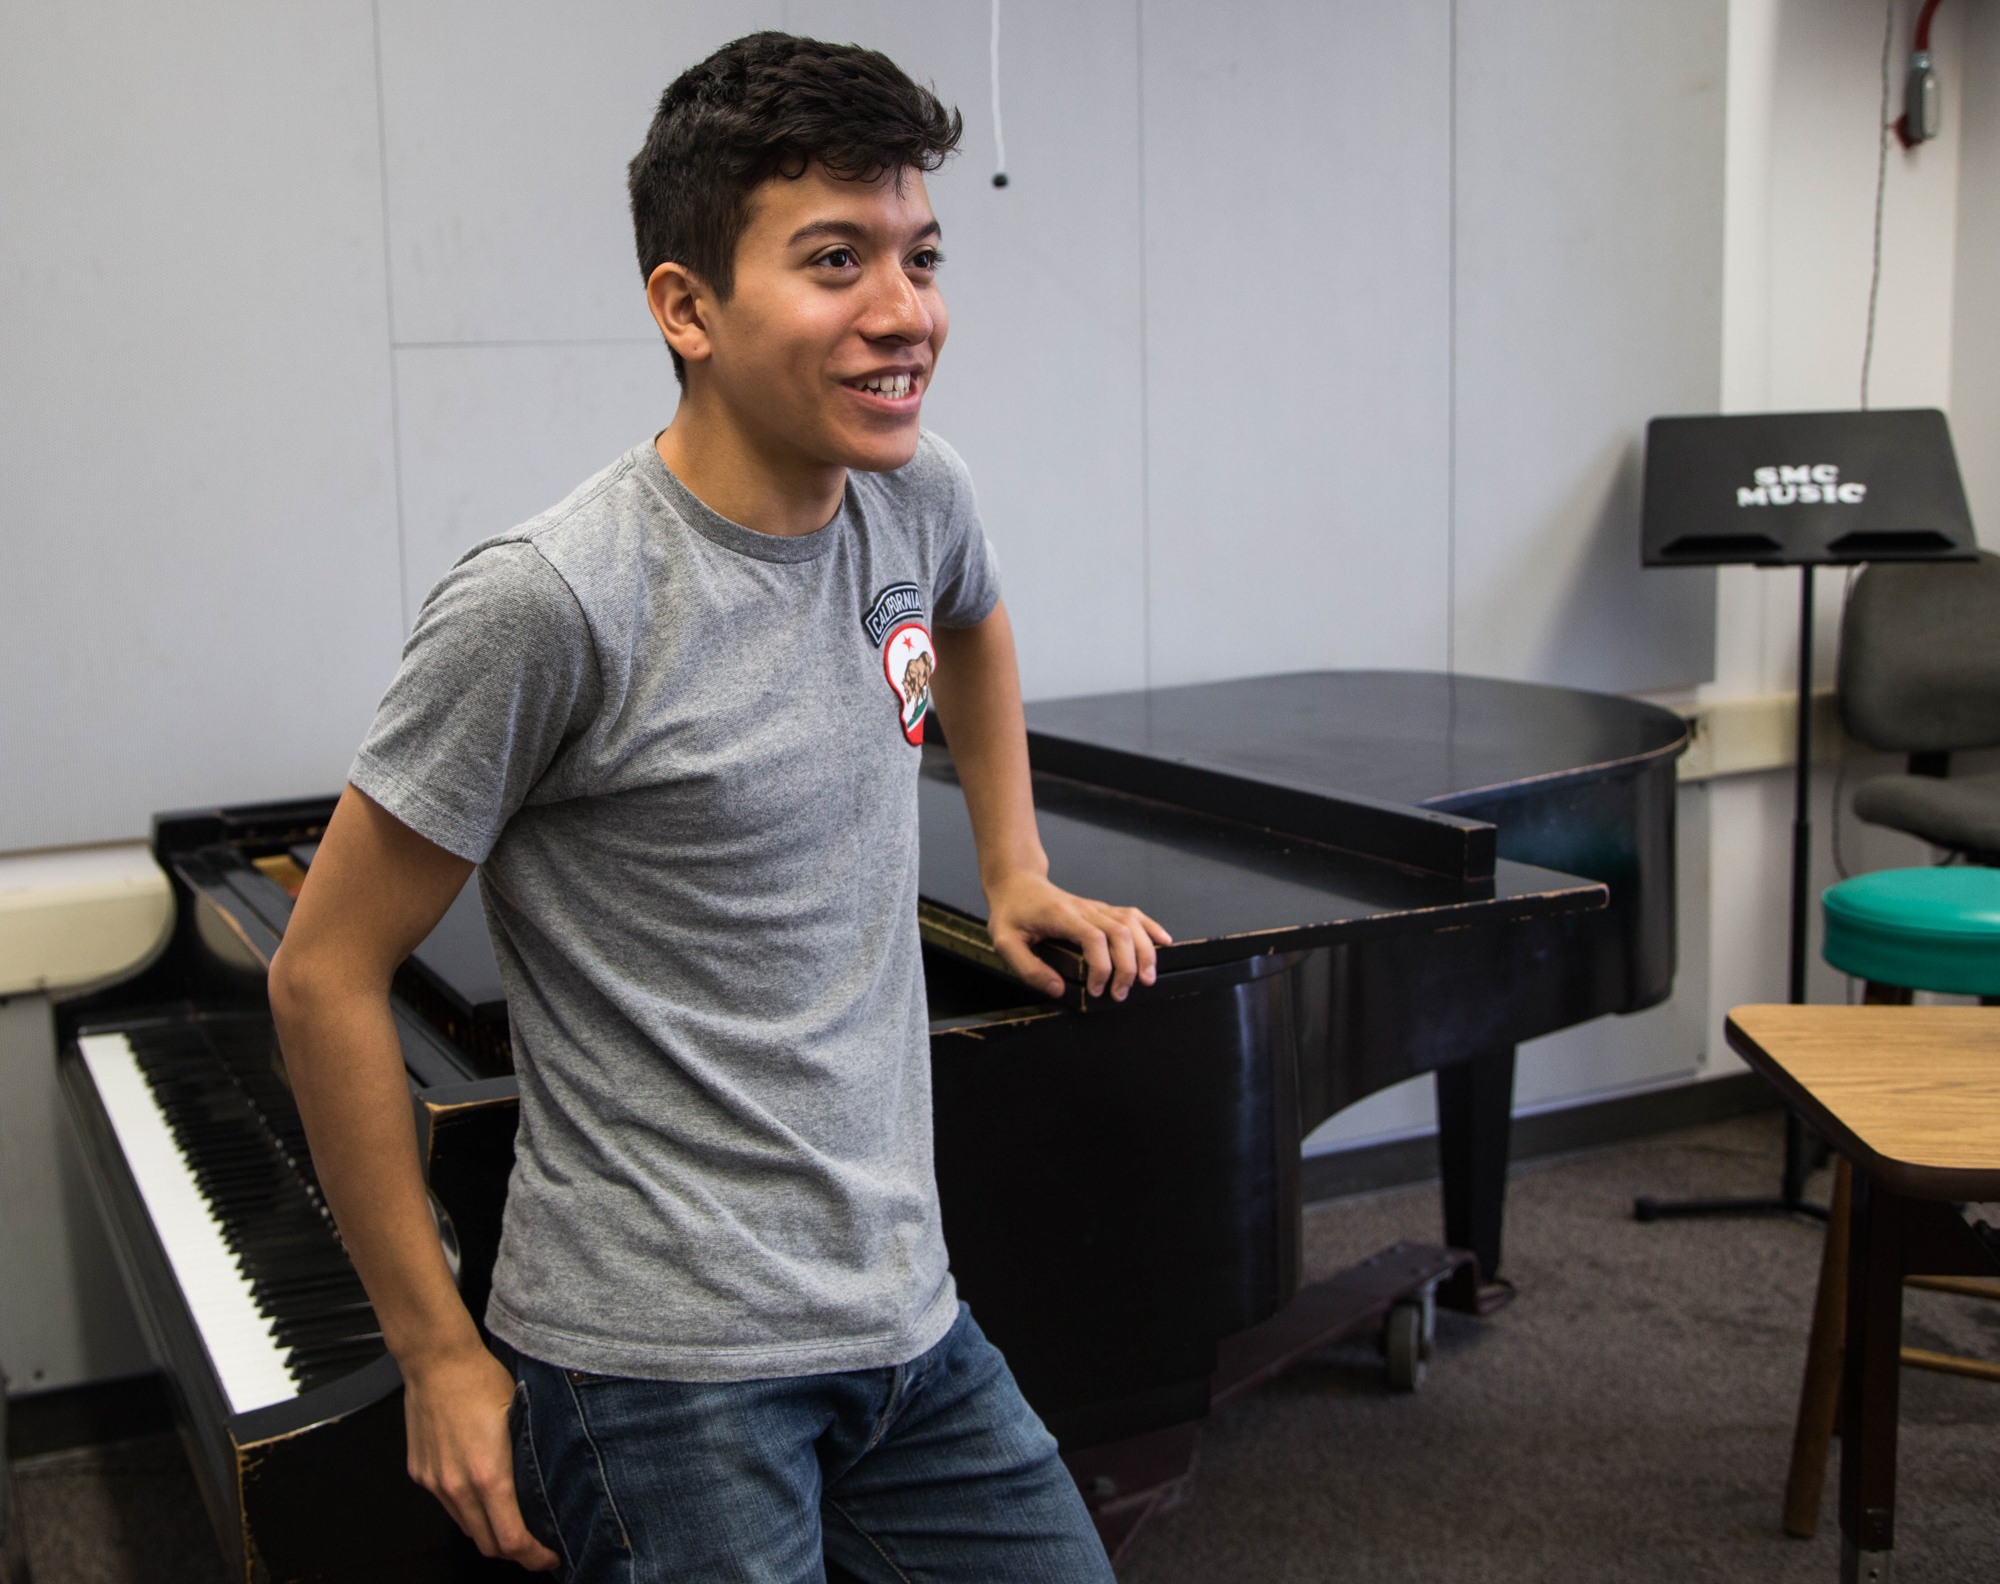 President of Santa Monica College's (SMC) Music Appreciation Club,  Leonardo Rodriguez (20), Thursday, March 22, 2018, at SMC's Performance Arts Center in Santa Monica, California. (Zeynep Abes/ Corsair Photo)